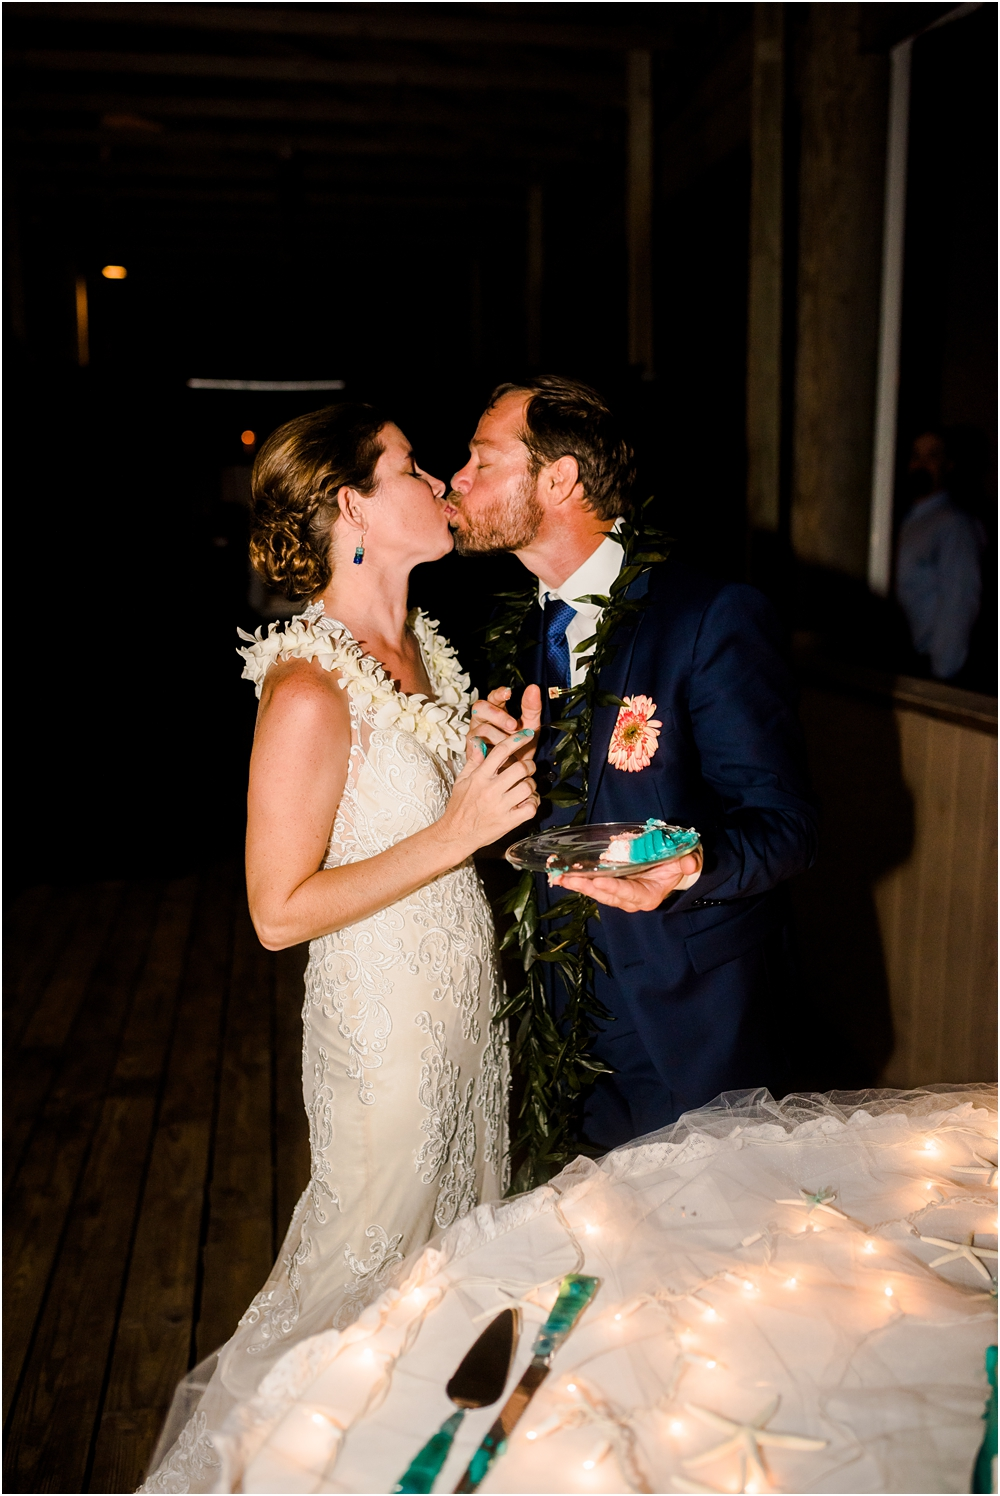 ledman-wedding-kiersten-stevenson-photography-30a-panama-city-beach-dothan-tallahassee-(641-of-763).JPG